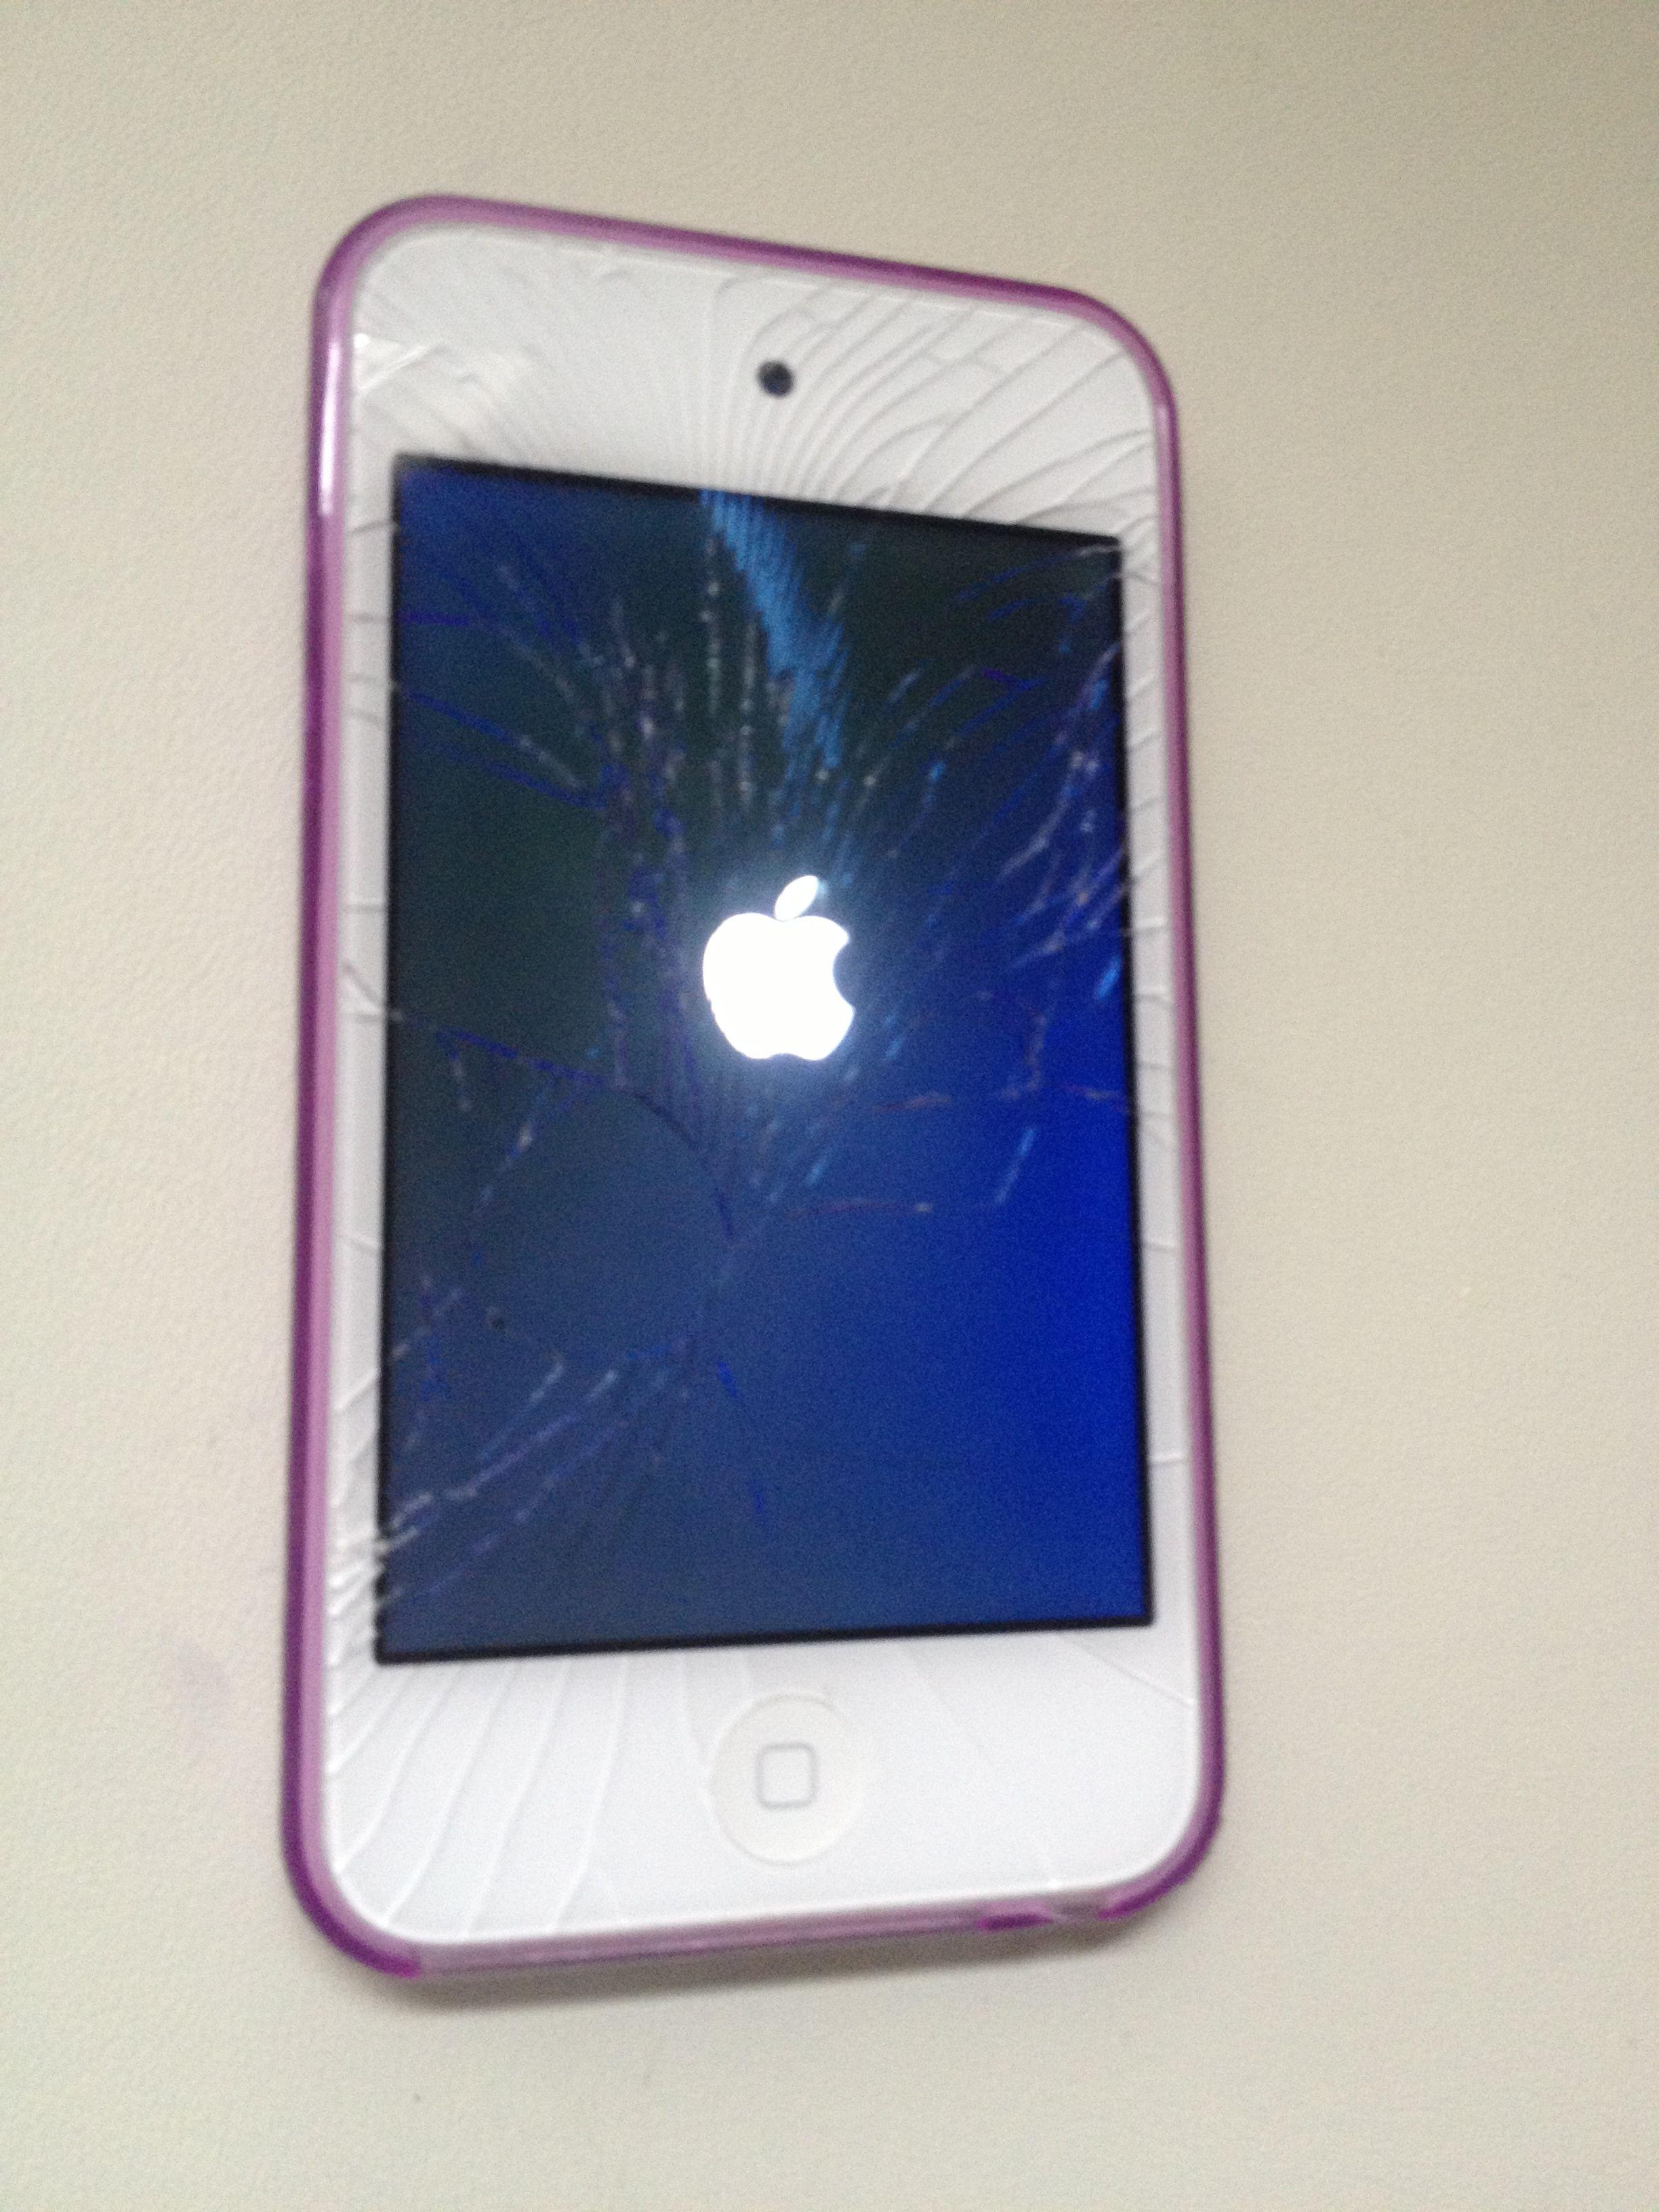 iPod Touch 4 Cracked Screen Repair,iPhone repair,iPad